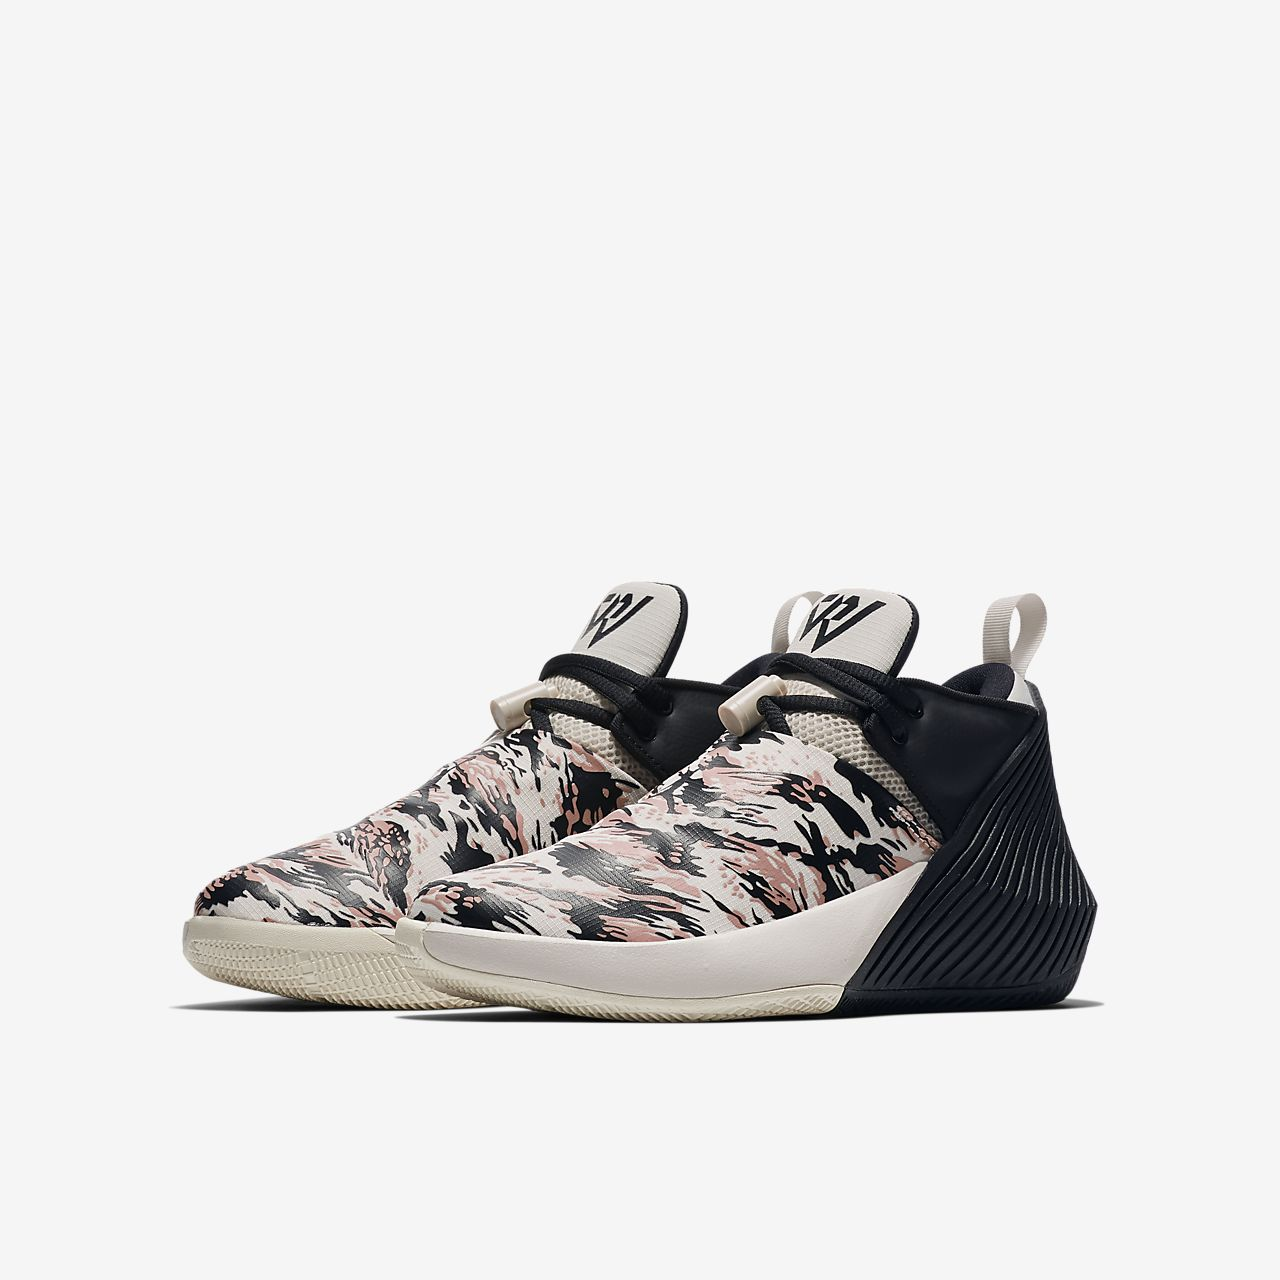 62c3d7d78d74 Jordan  Why Not   Zer0.1 Low Boys  Basketball Shoe. Nike.com IN